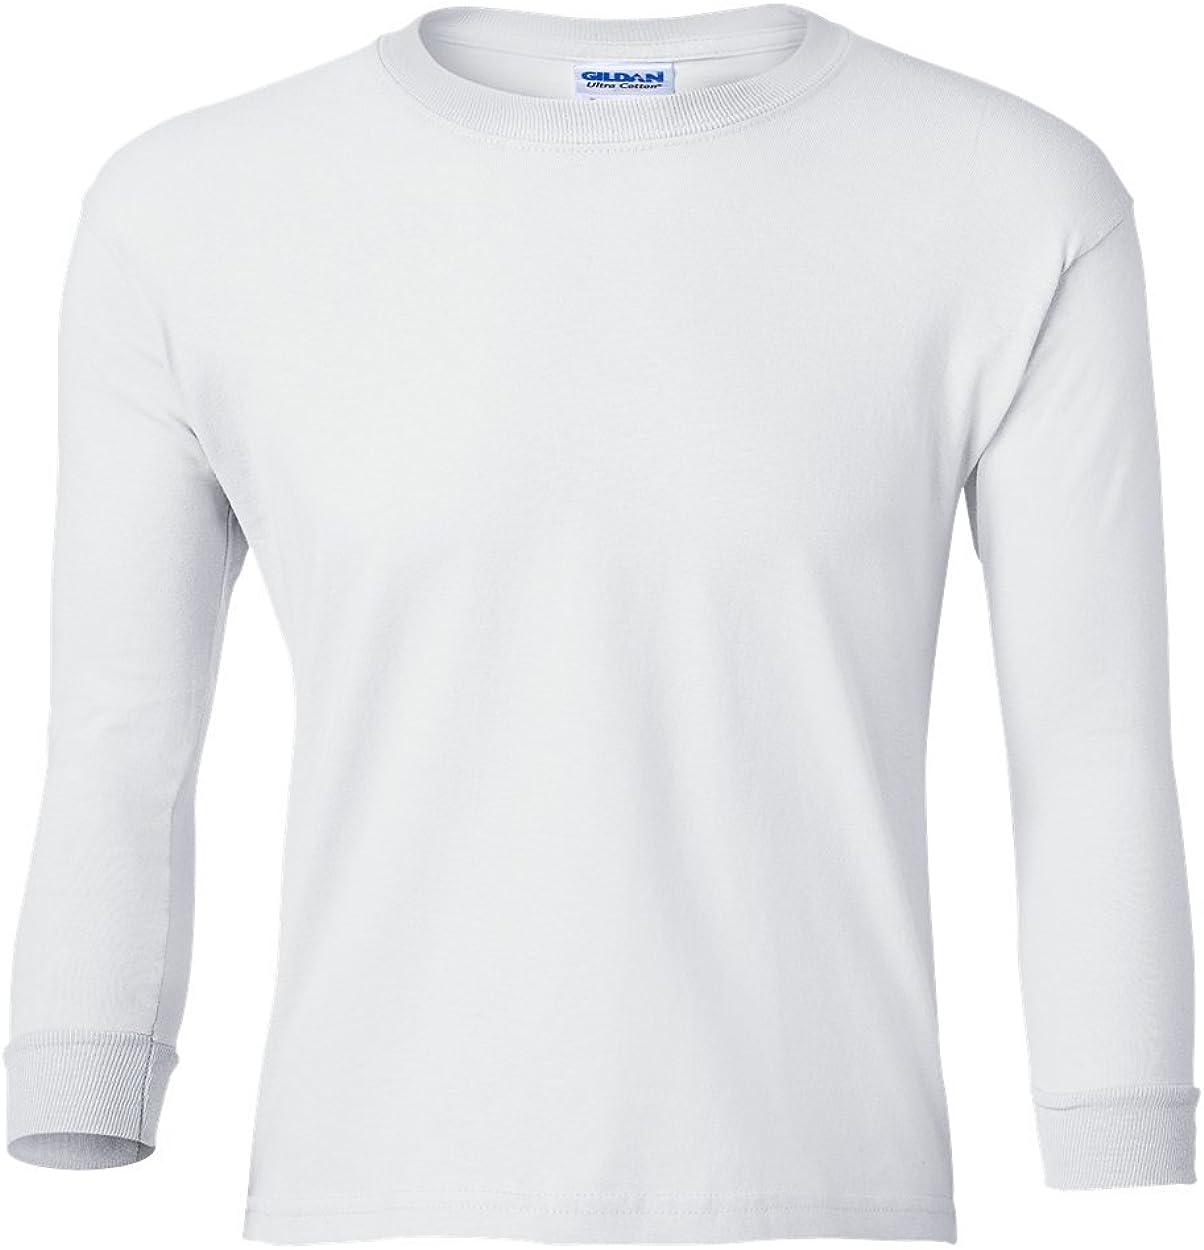 Fashion Gildan 2400B Cotton Youth L Sleeve T Shirt White Medium